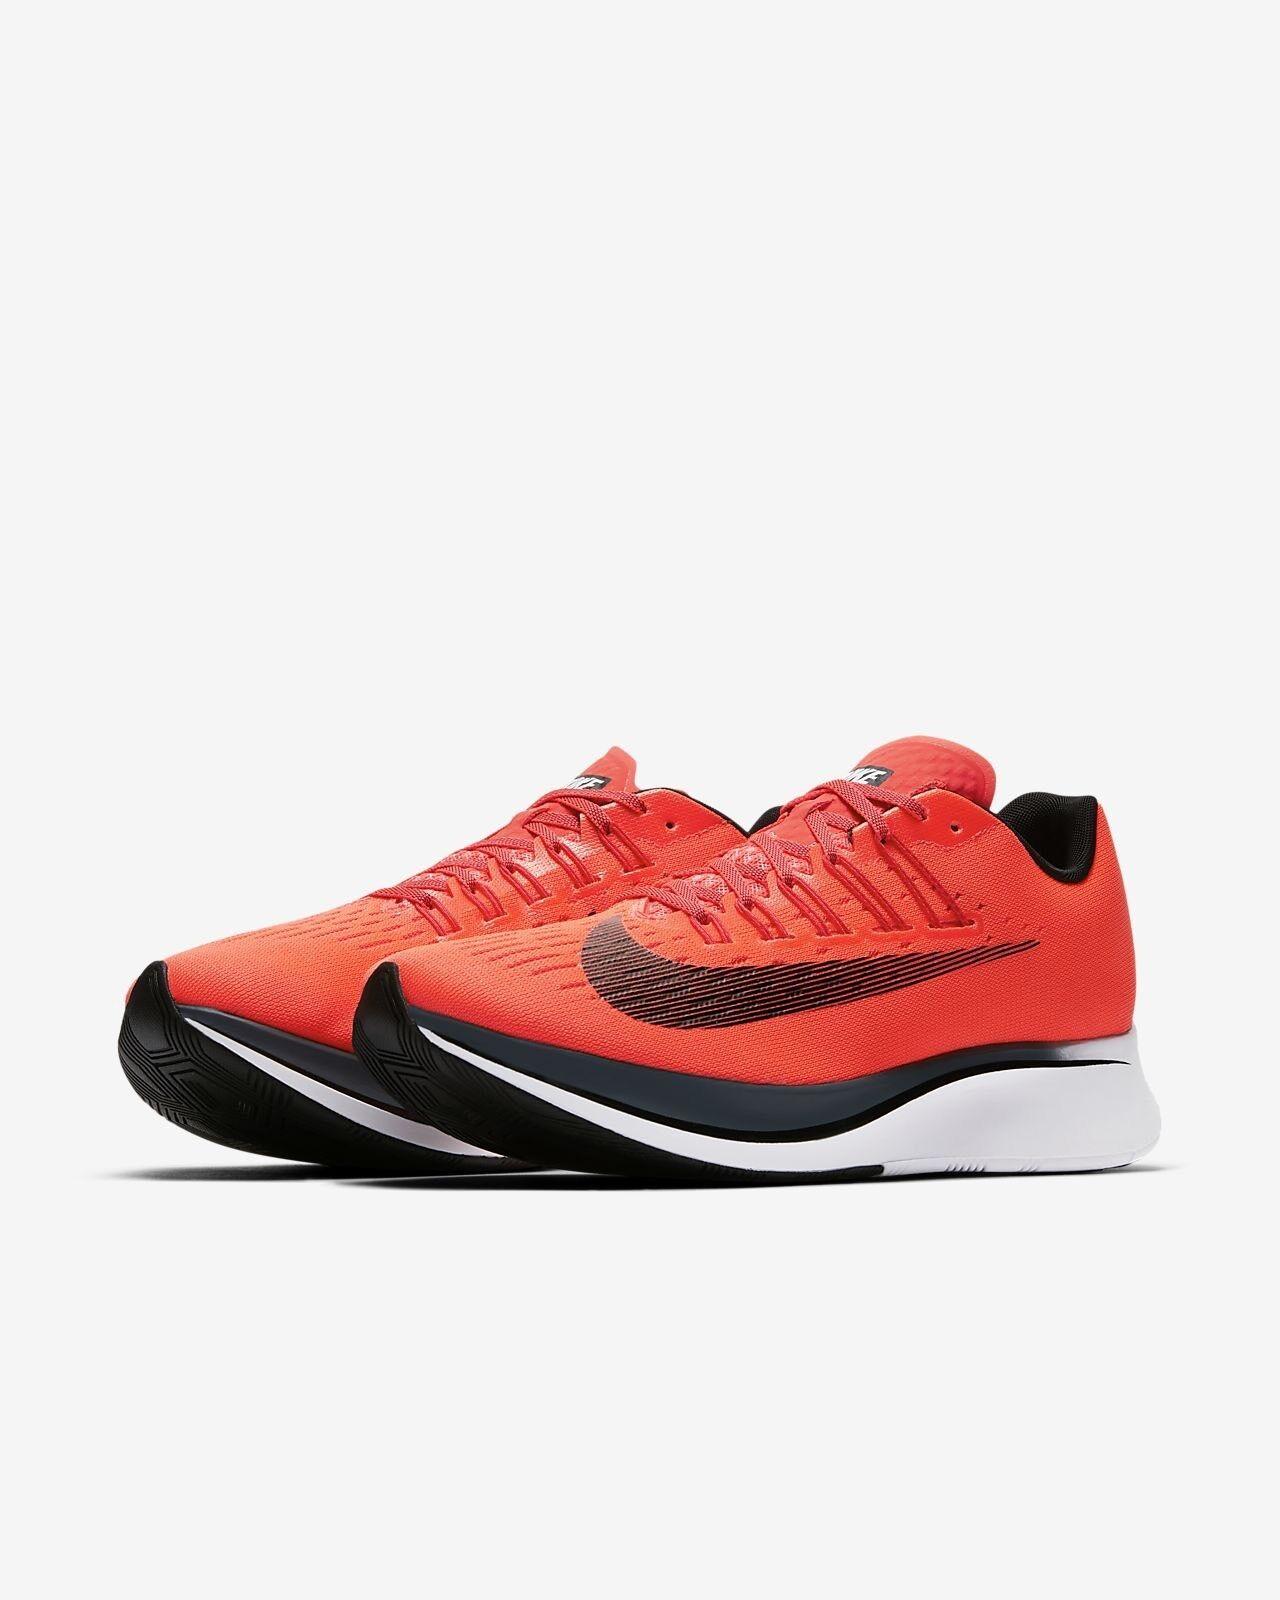 Men's Nike Zoom Fly Bright Crimson Black bluee Fox 880848-614 Size 15